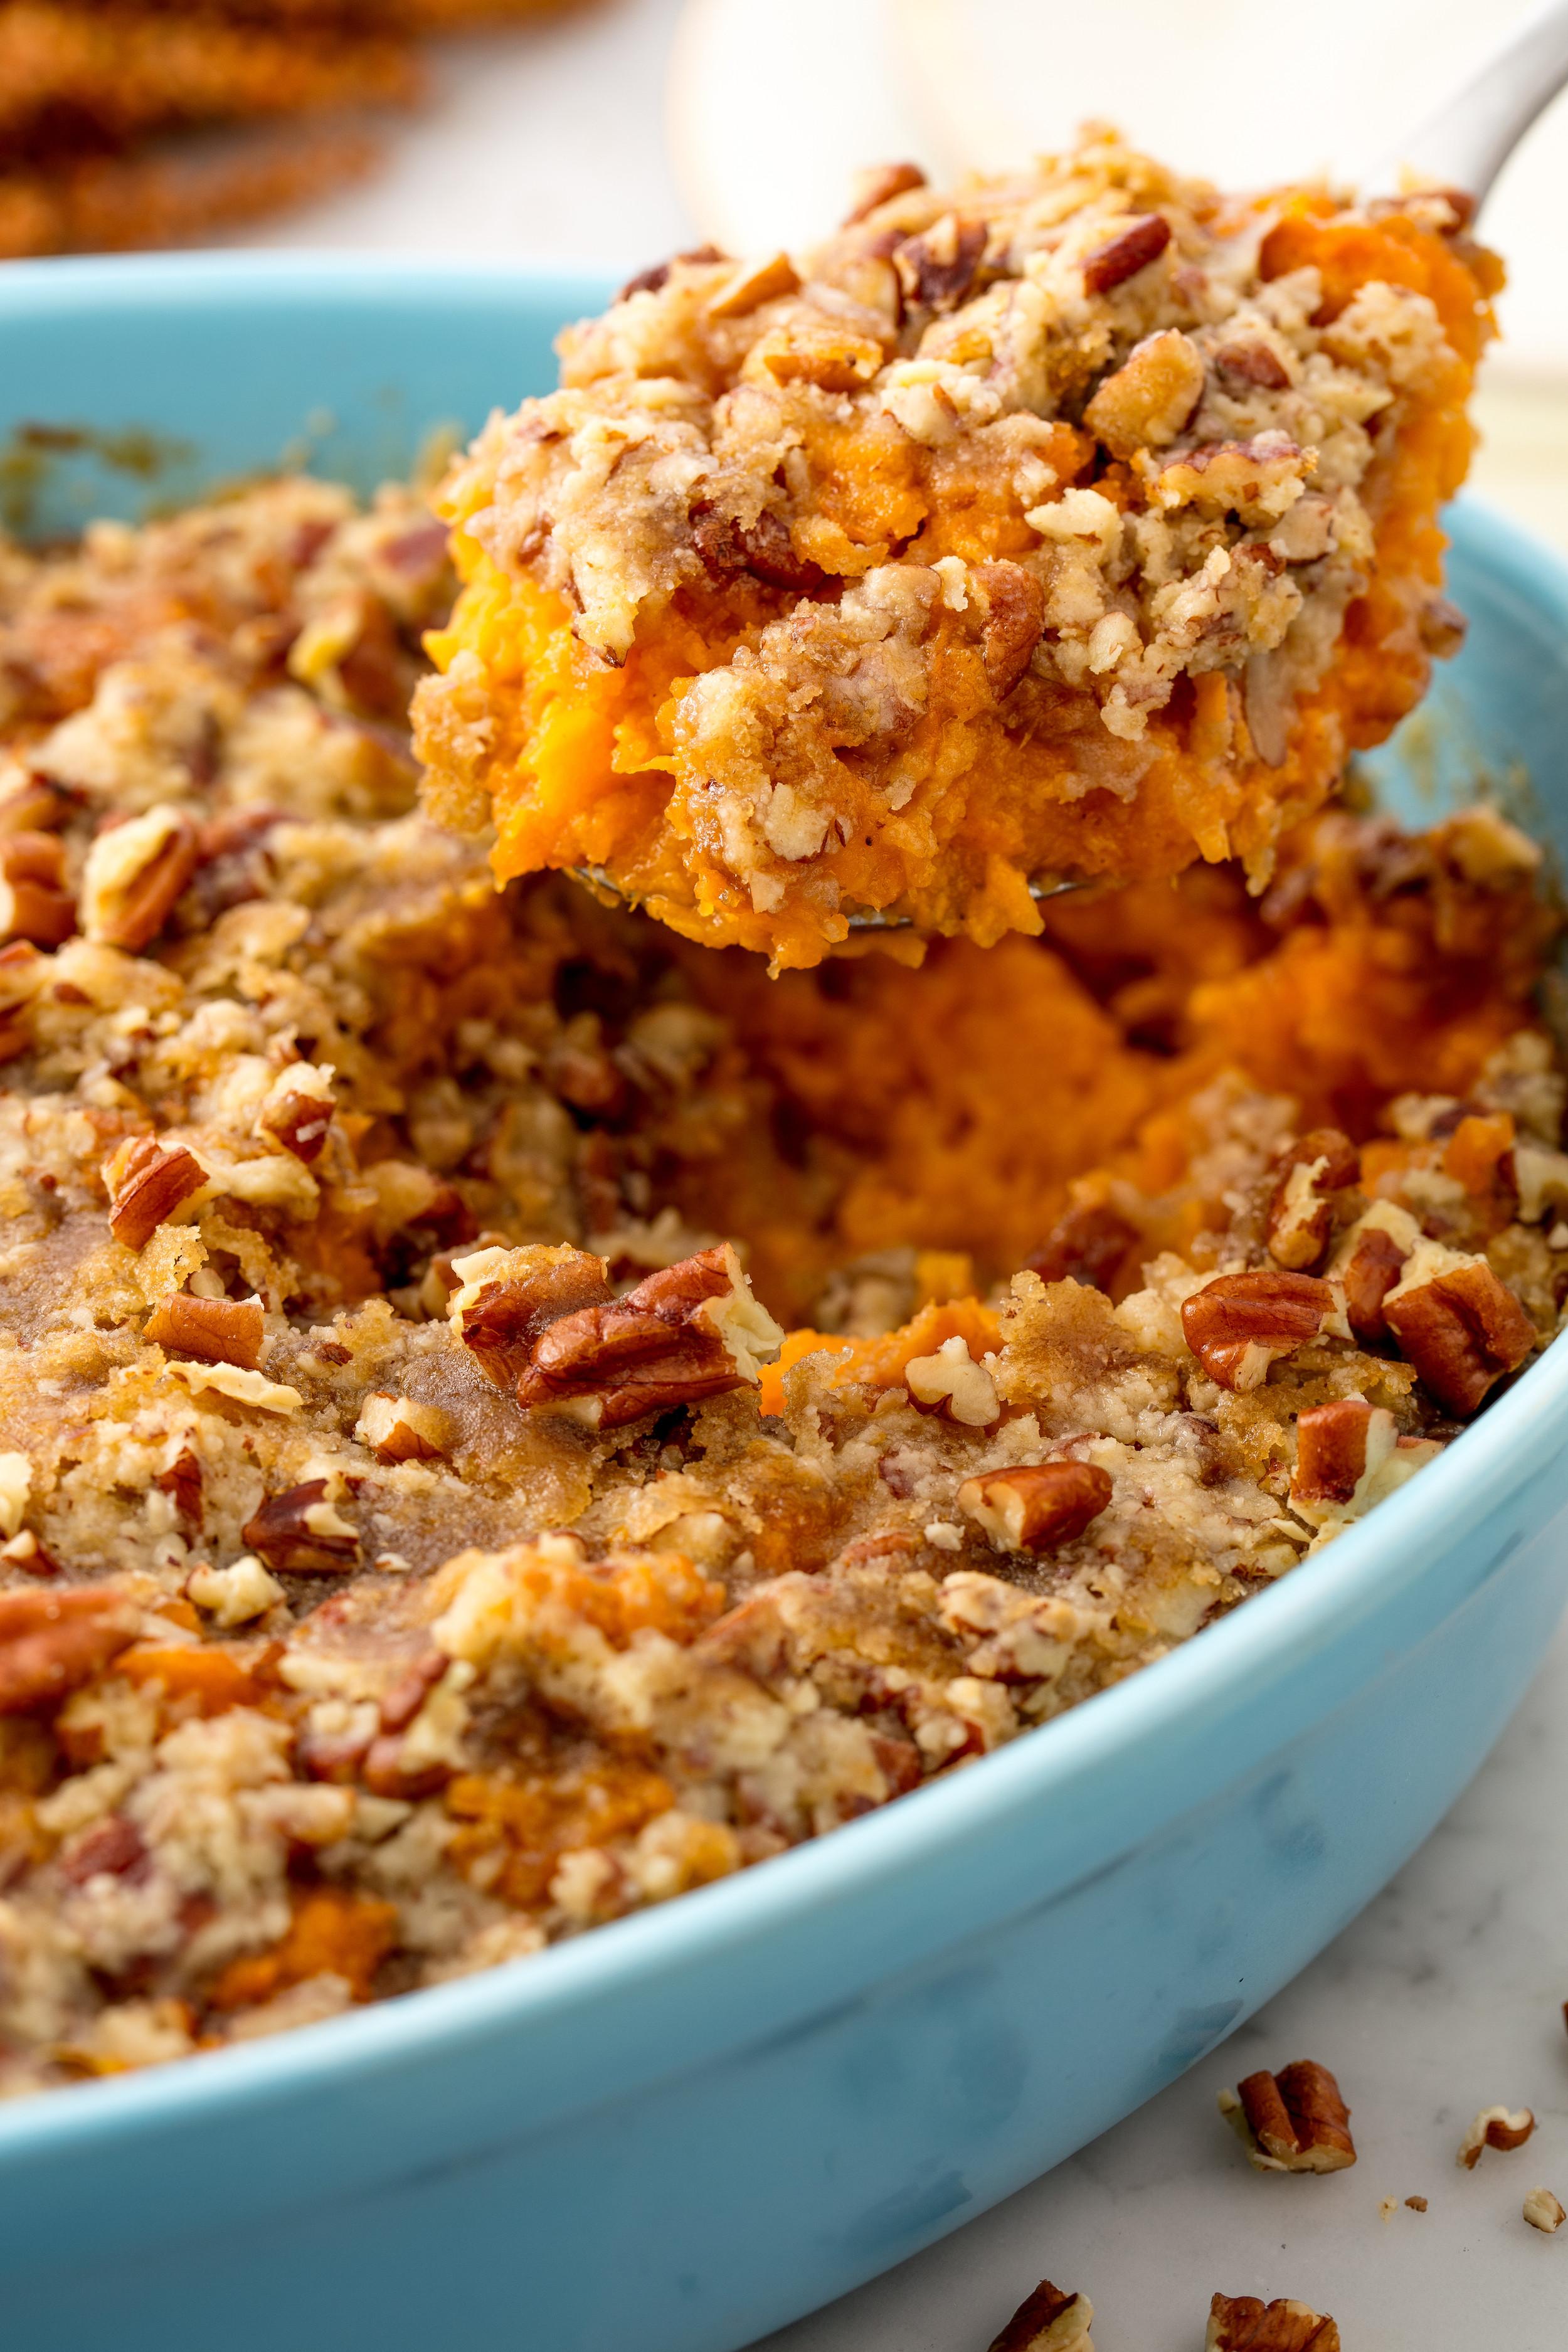 Easy Sweet Potato Casserole  20 Easy Sweet Potato Casserole Recipes How to Make the